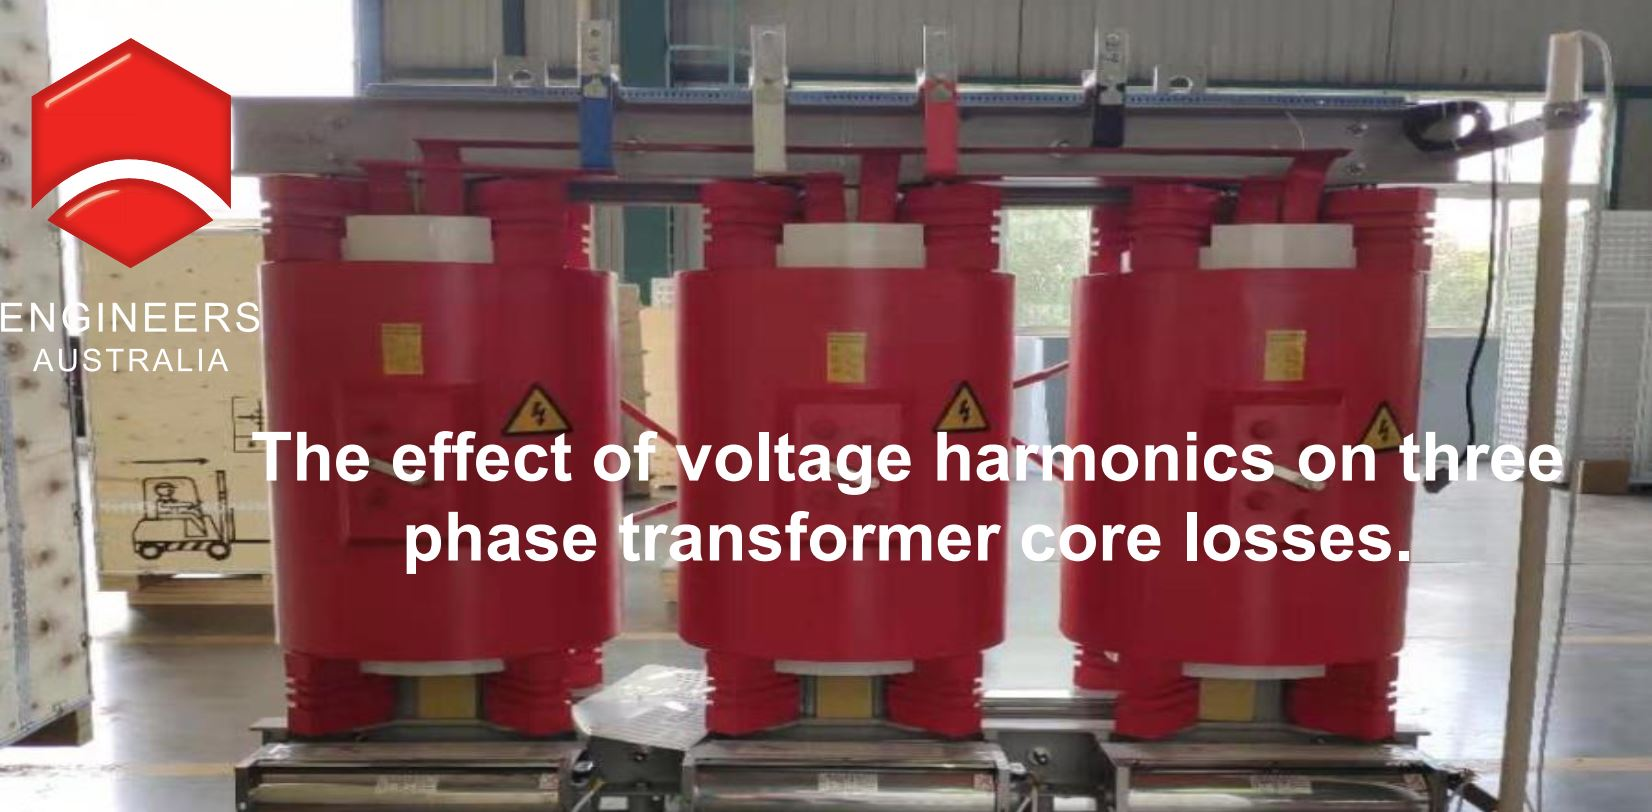 [Upcoming Webinar] Voltage Harmonics on Three Phase Transformer Core Losses